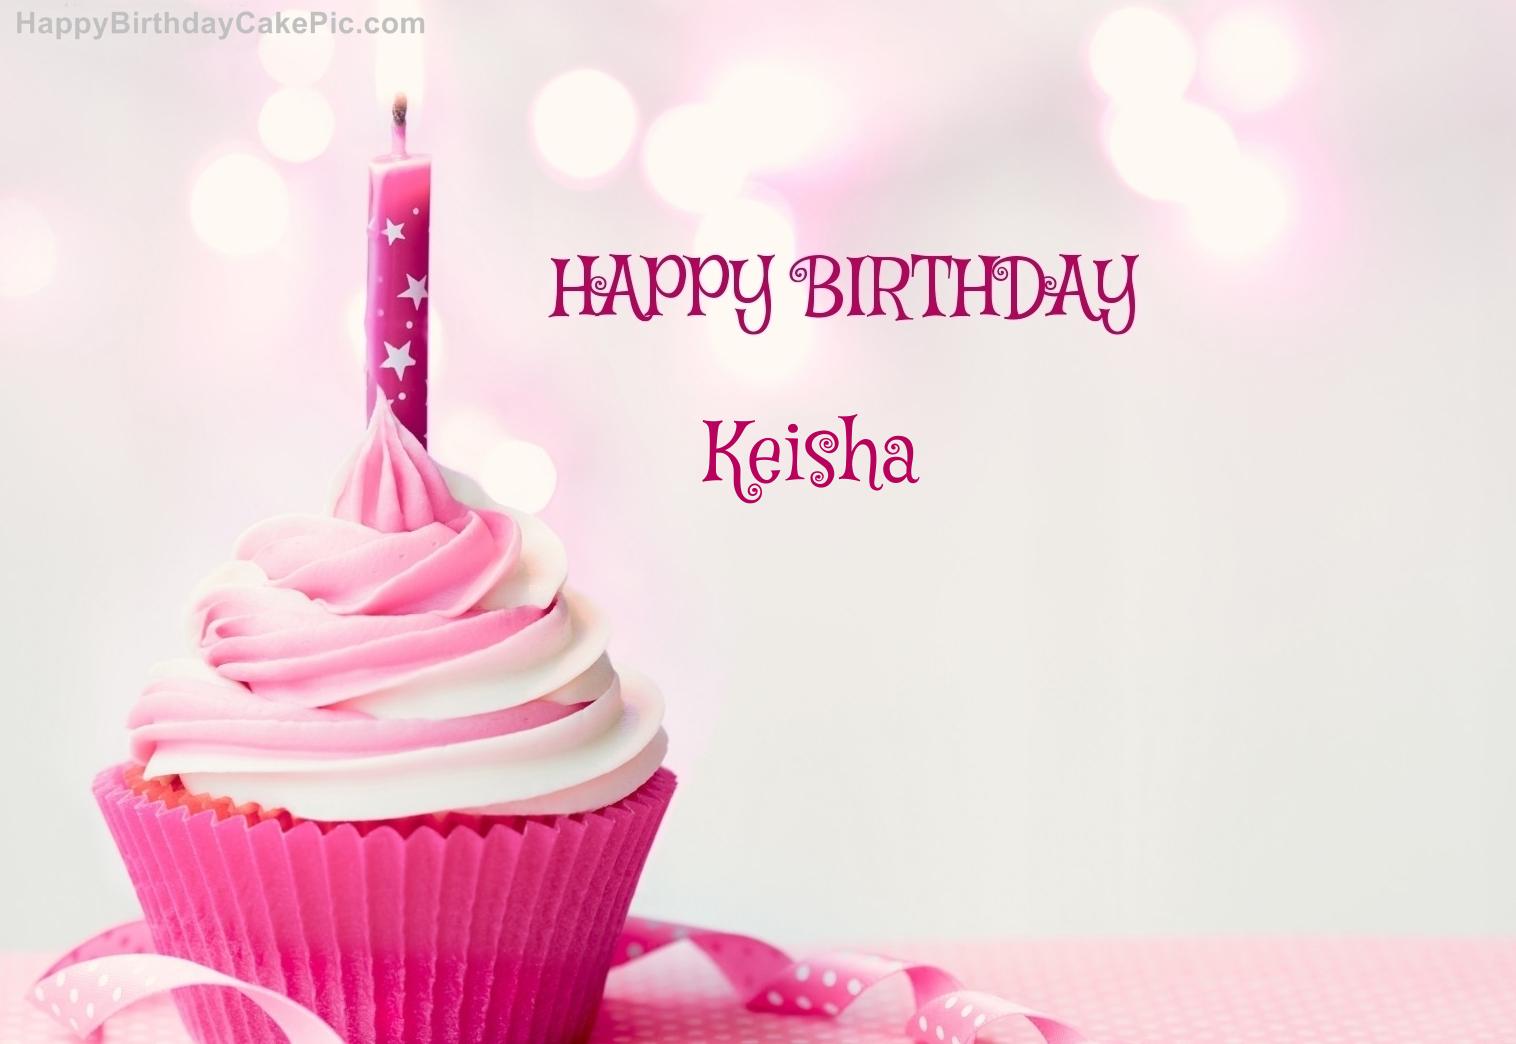 ️ Happy Birthday Cupcake Candle Pink Cake For Keisha